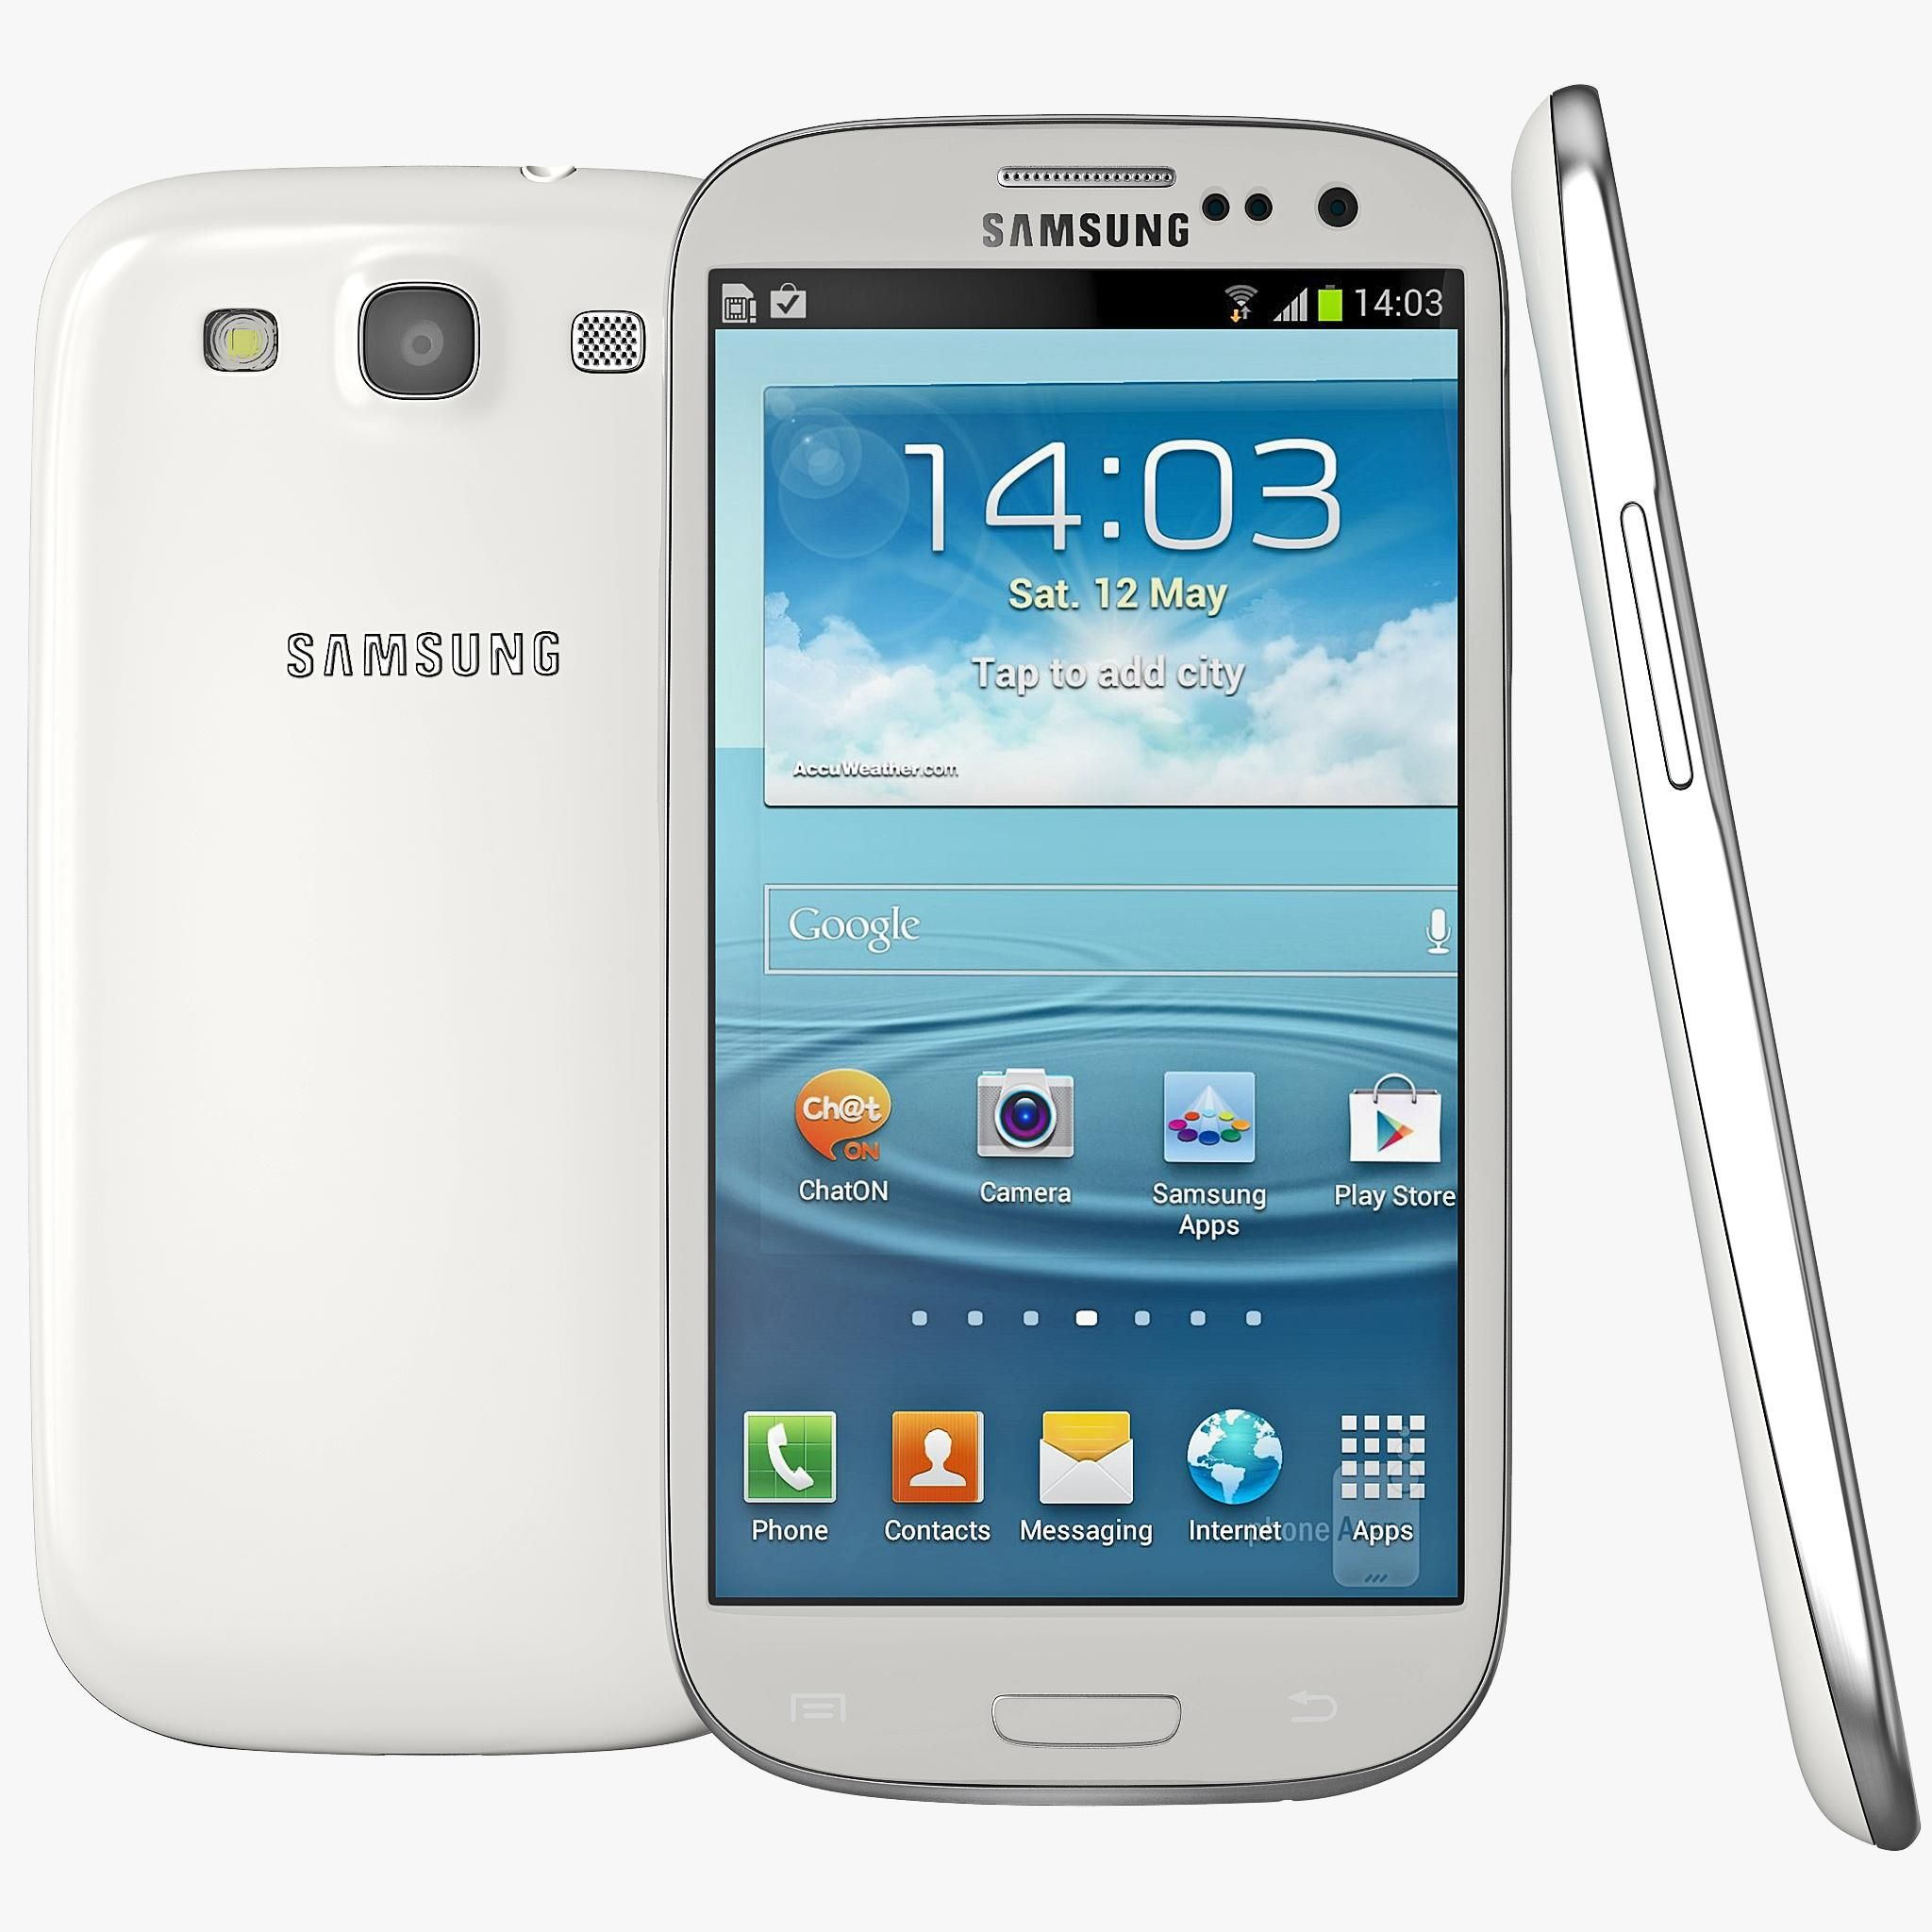 Samsung Galaxy S3 3d Model Ad Galaxy Samsung Model Samsung Galaxy S3 Galaxy S3 Galaxy